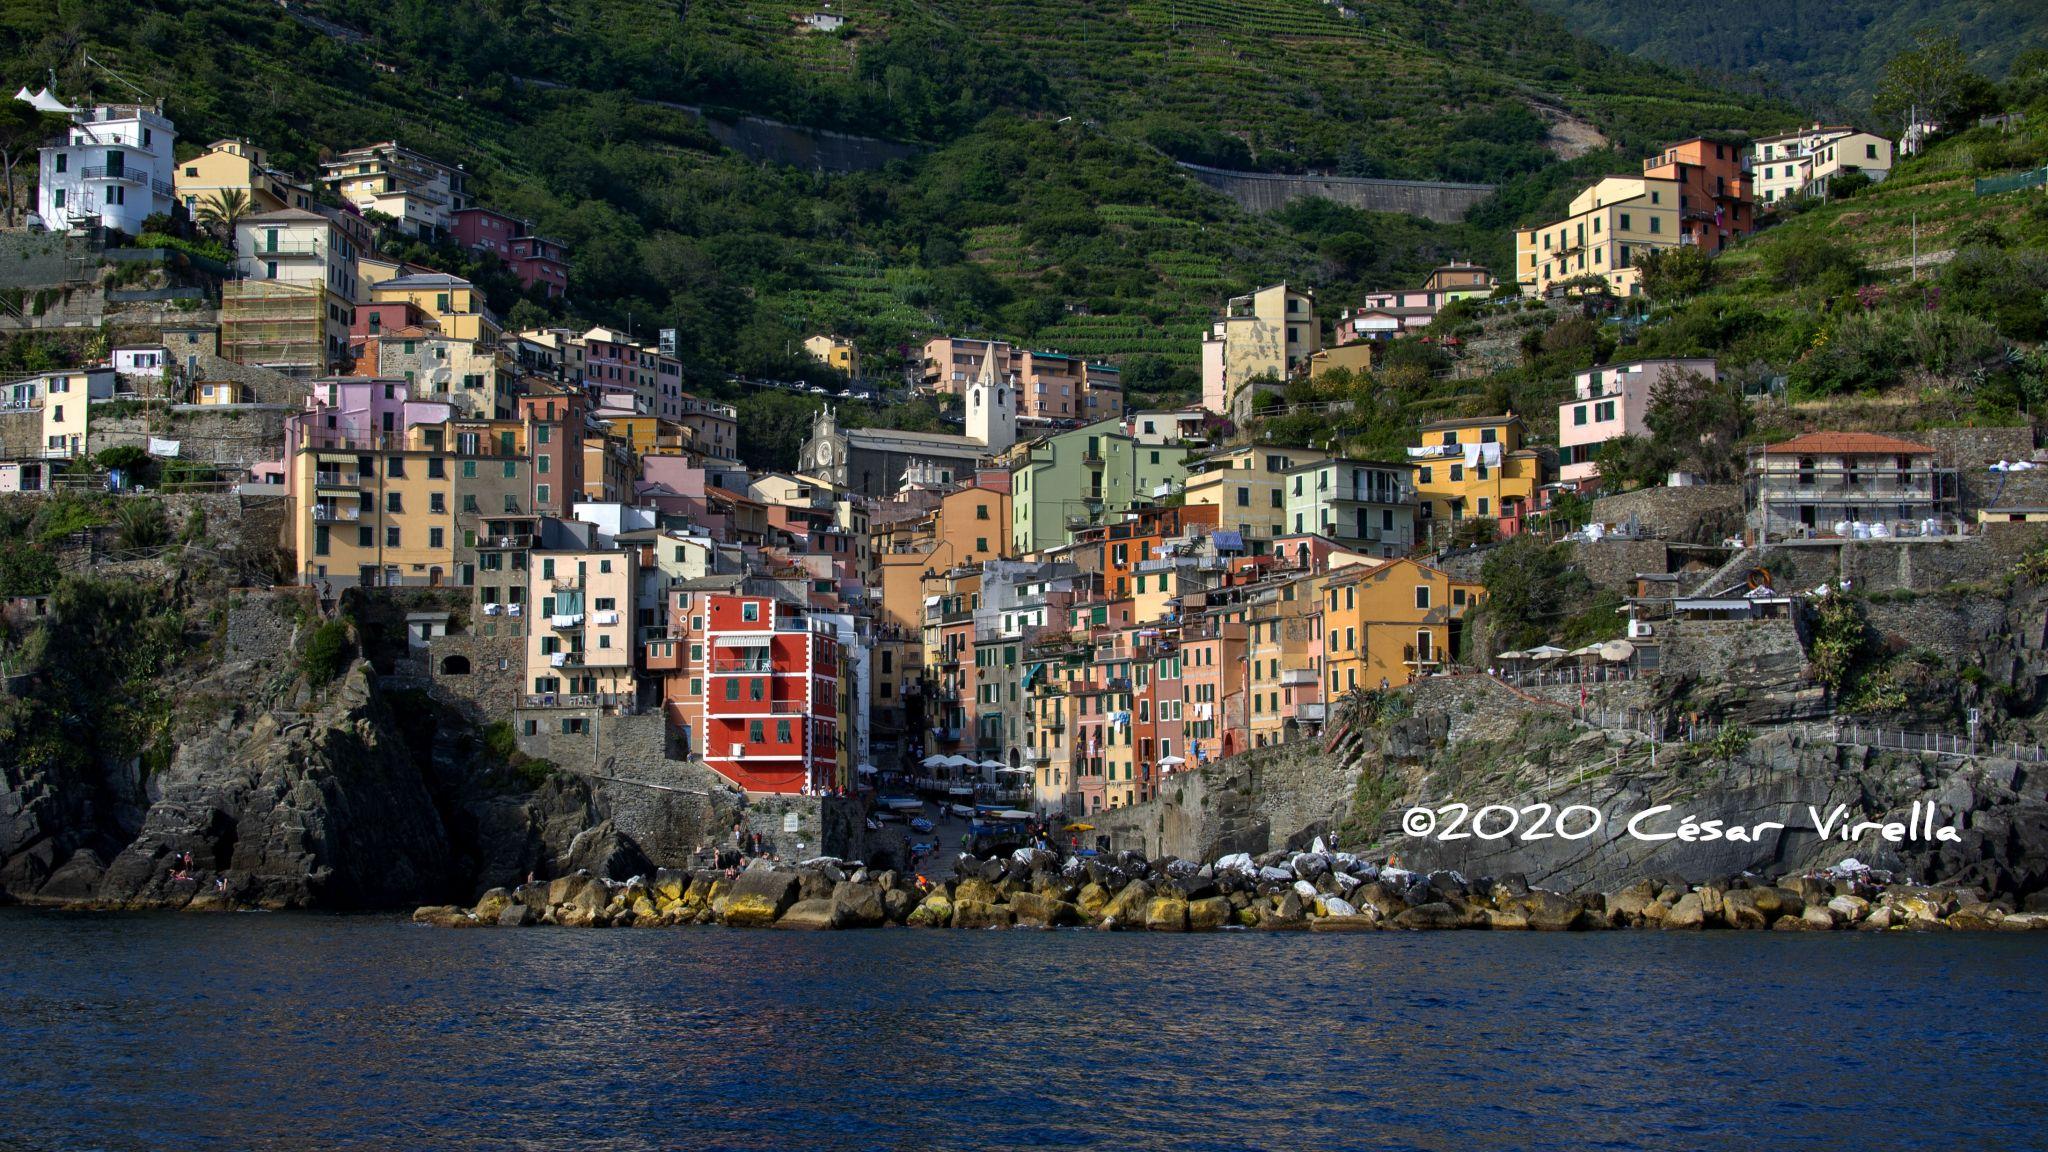 Cinque Terre by Ferry, Italy